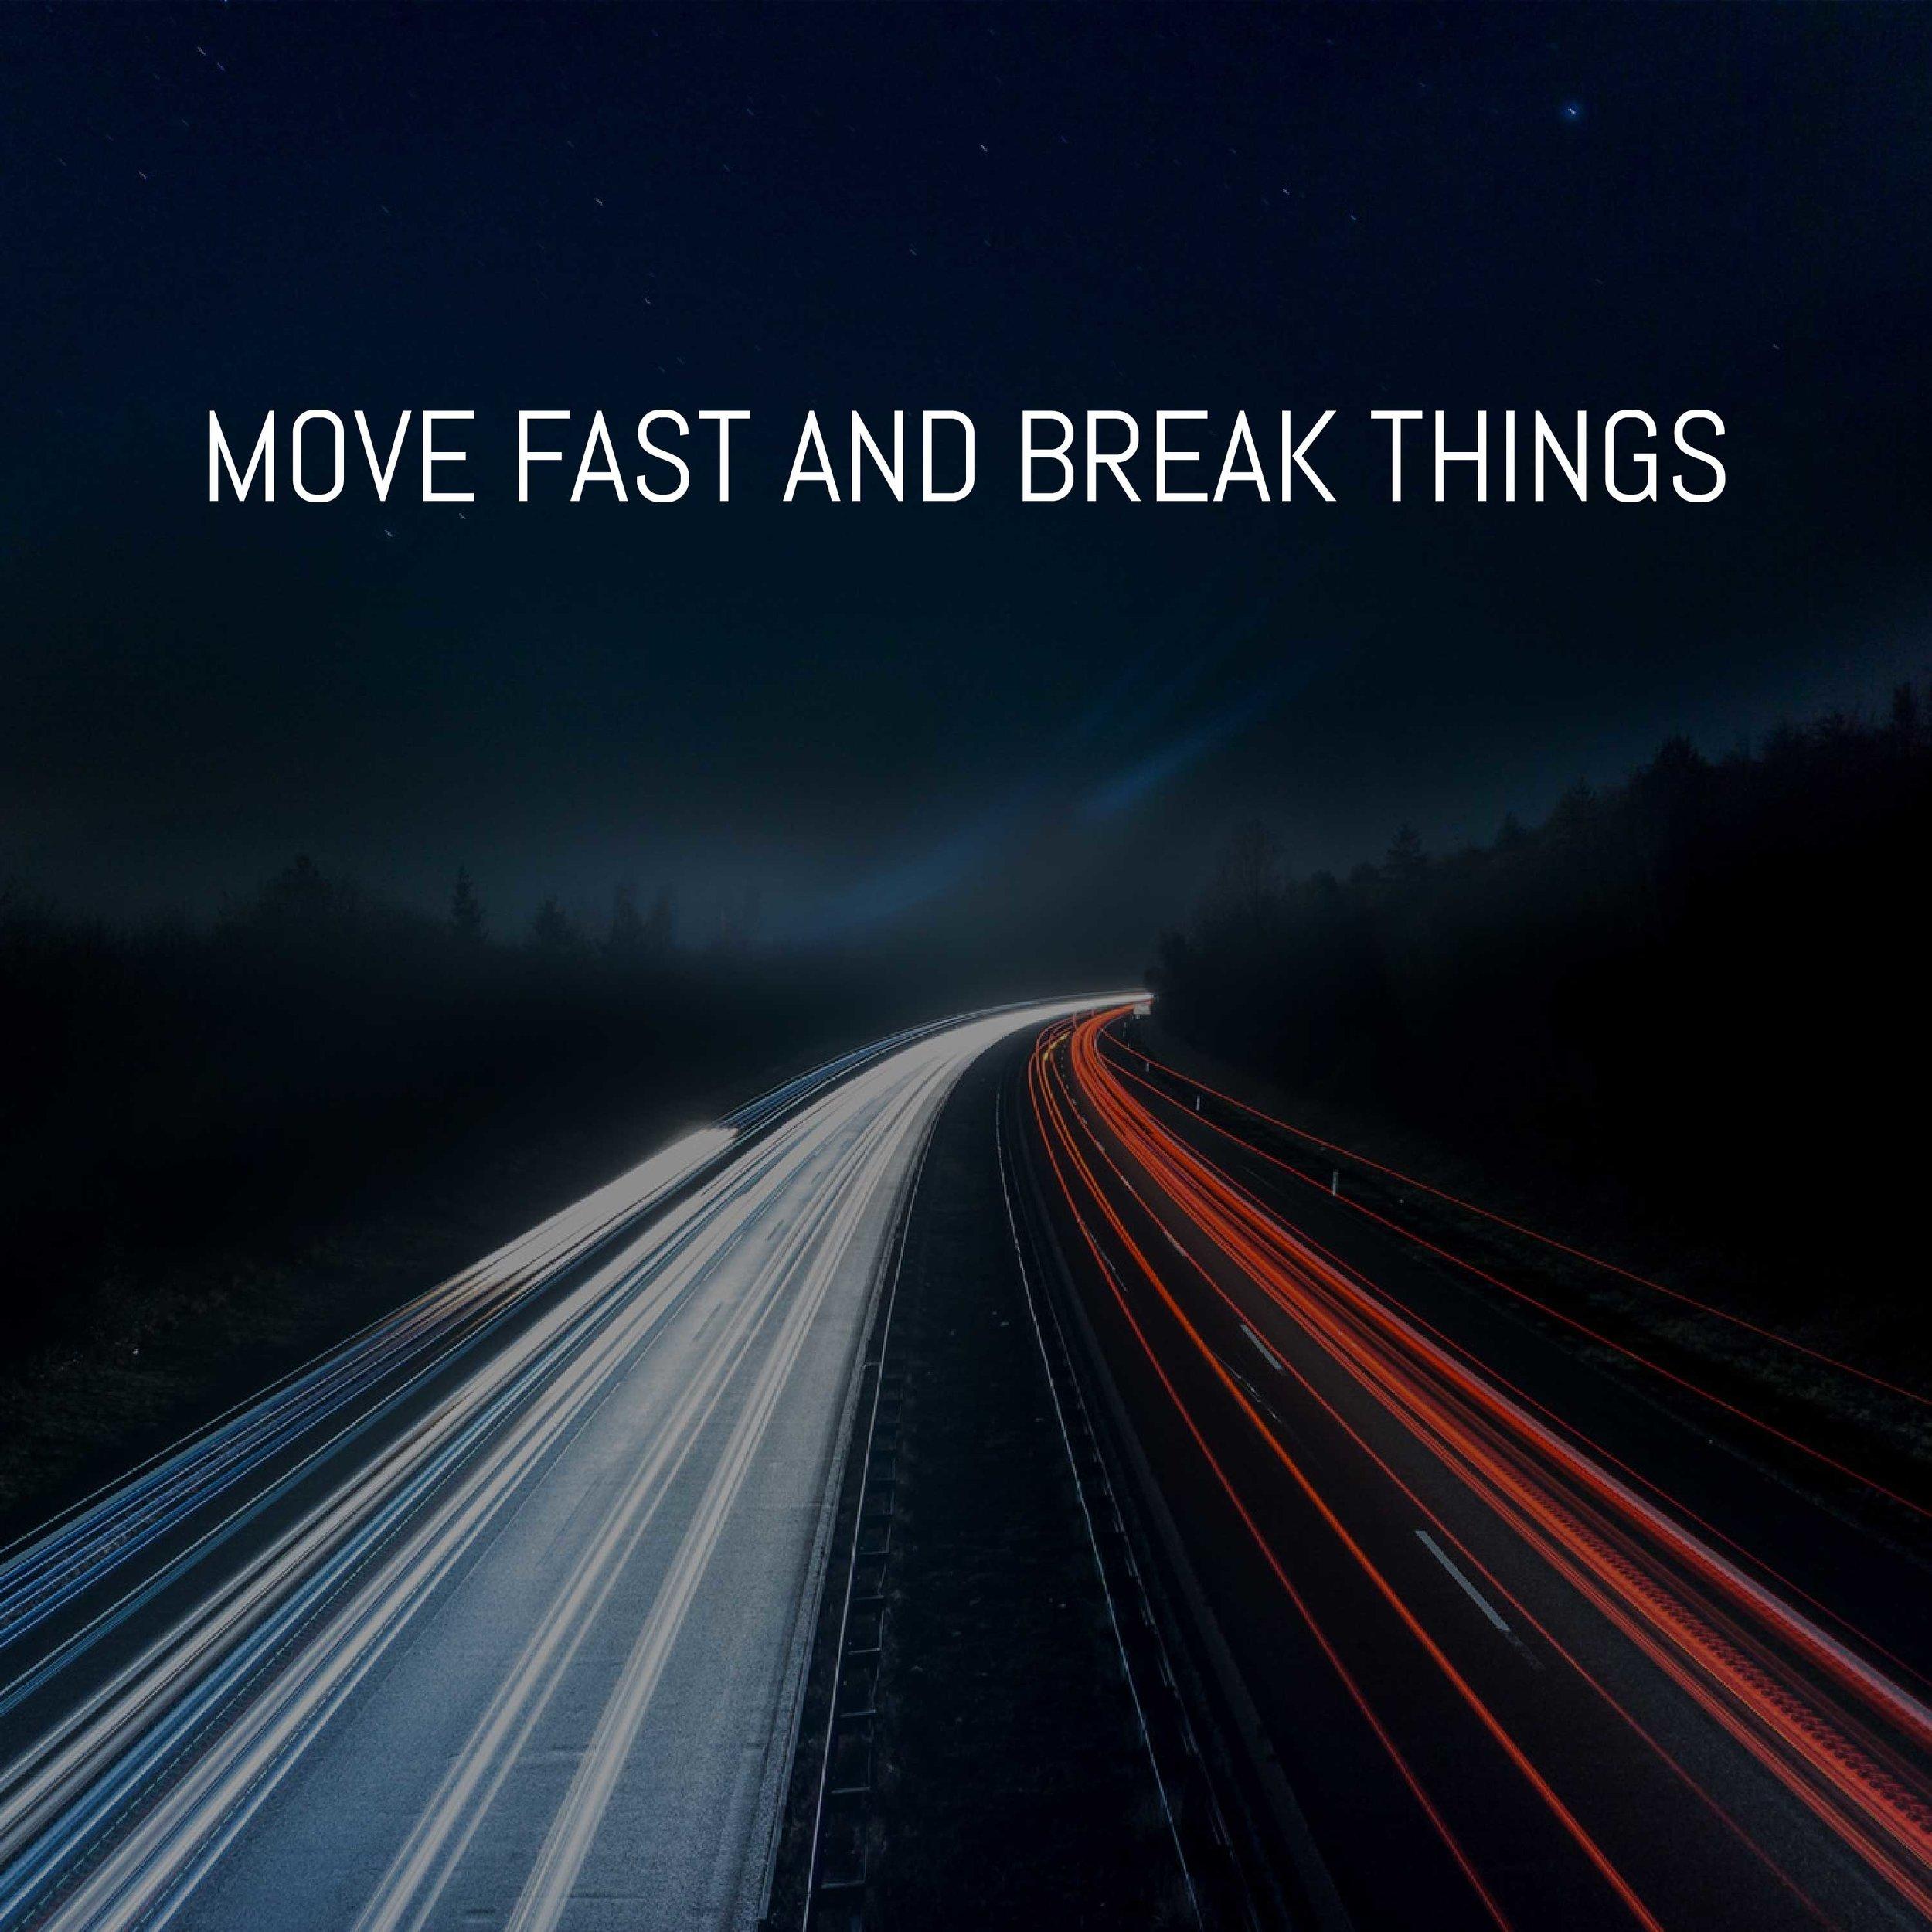 MOVE-FAST-AND-BREAK-THINGS.jpg